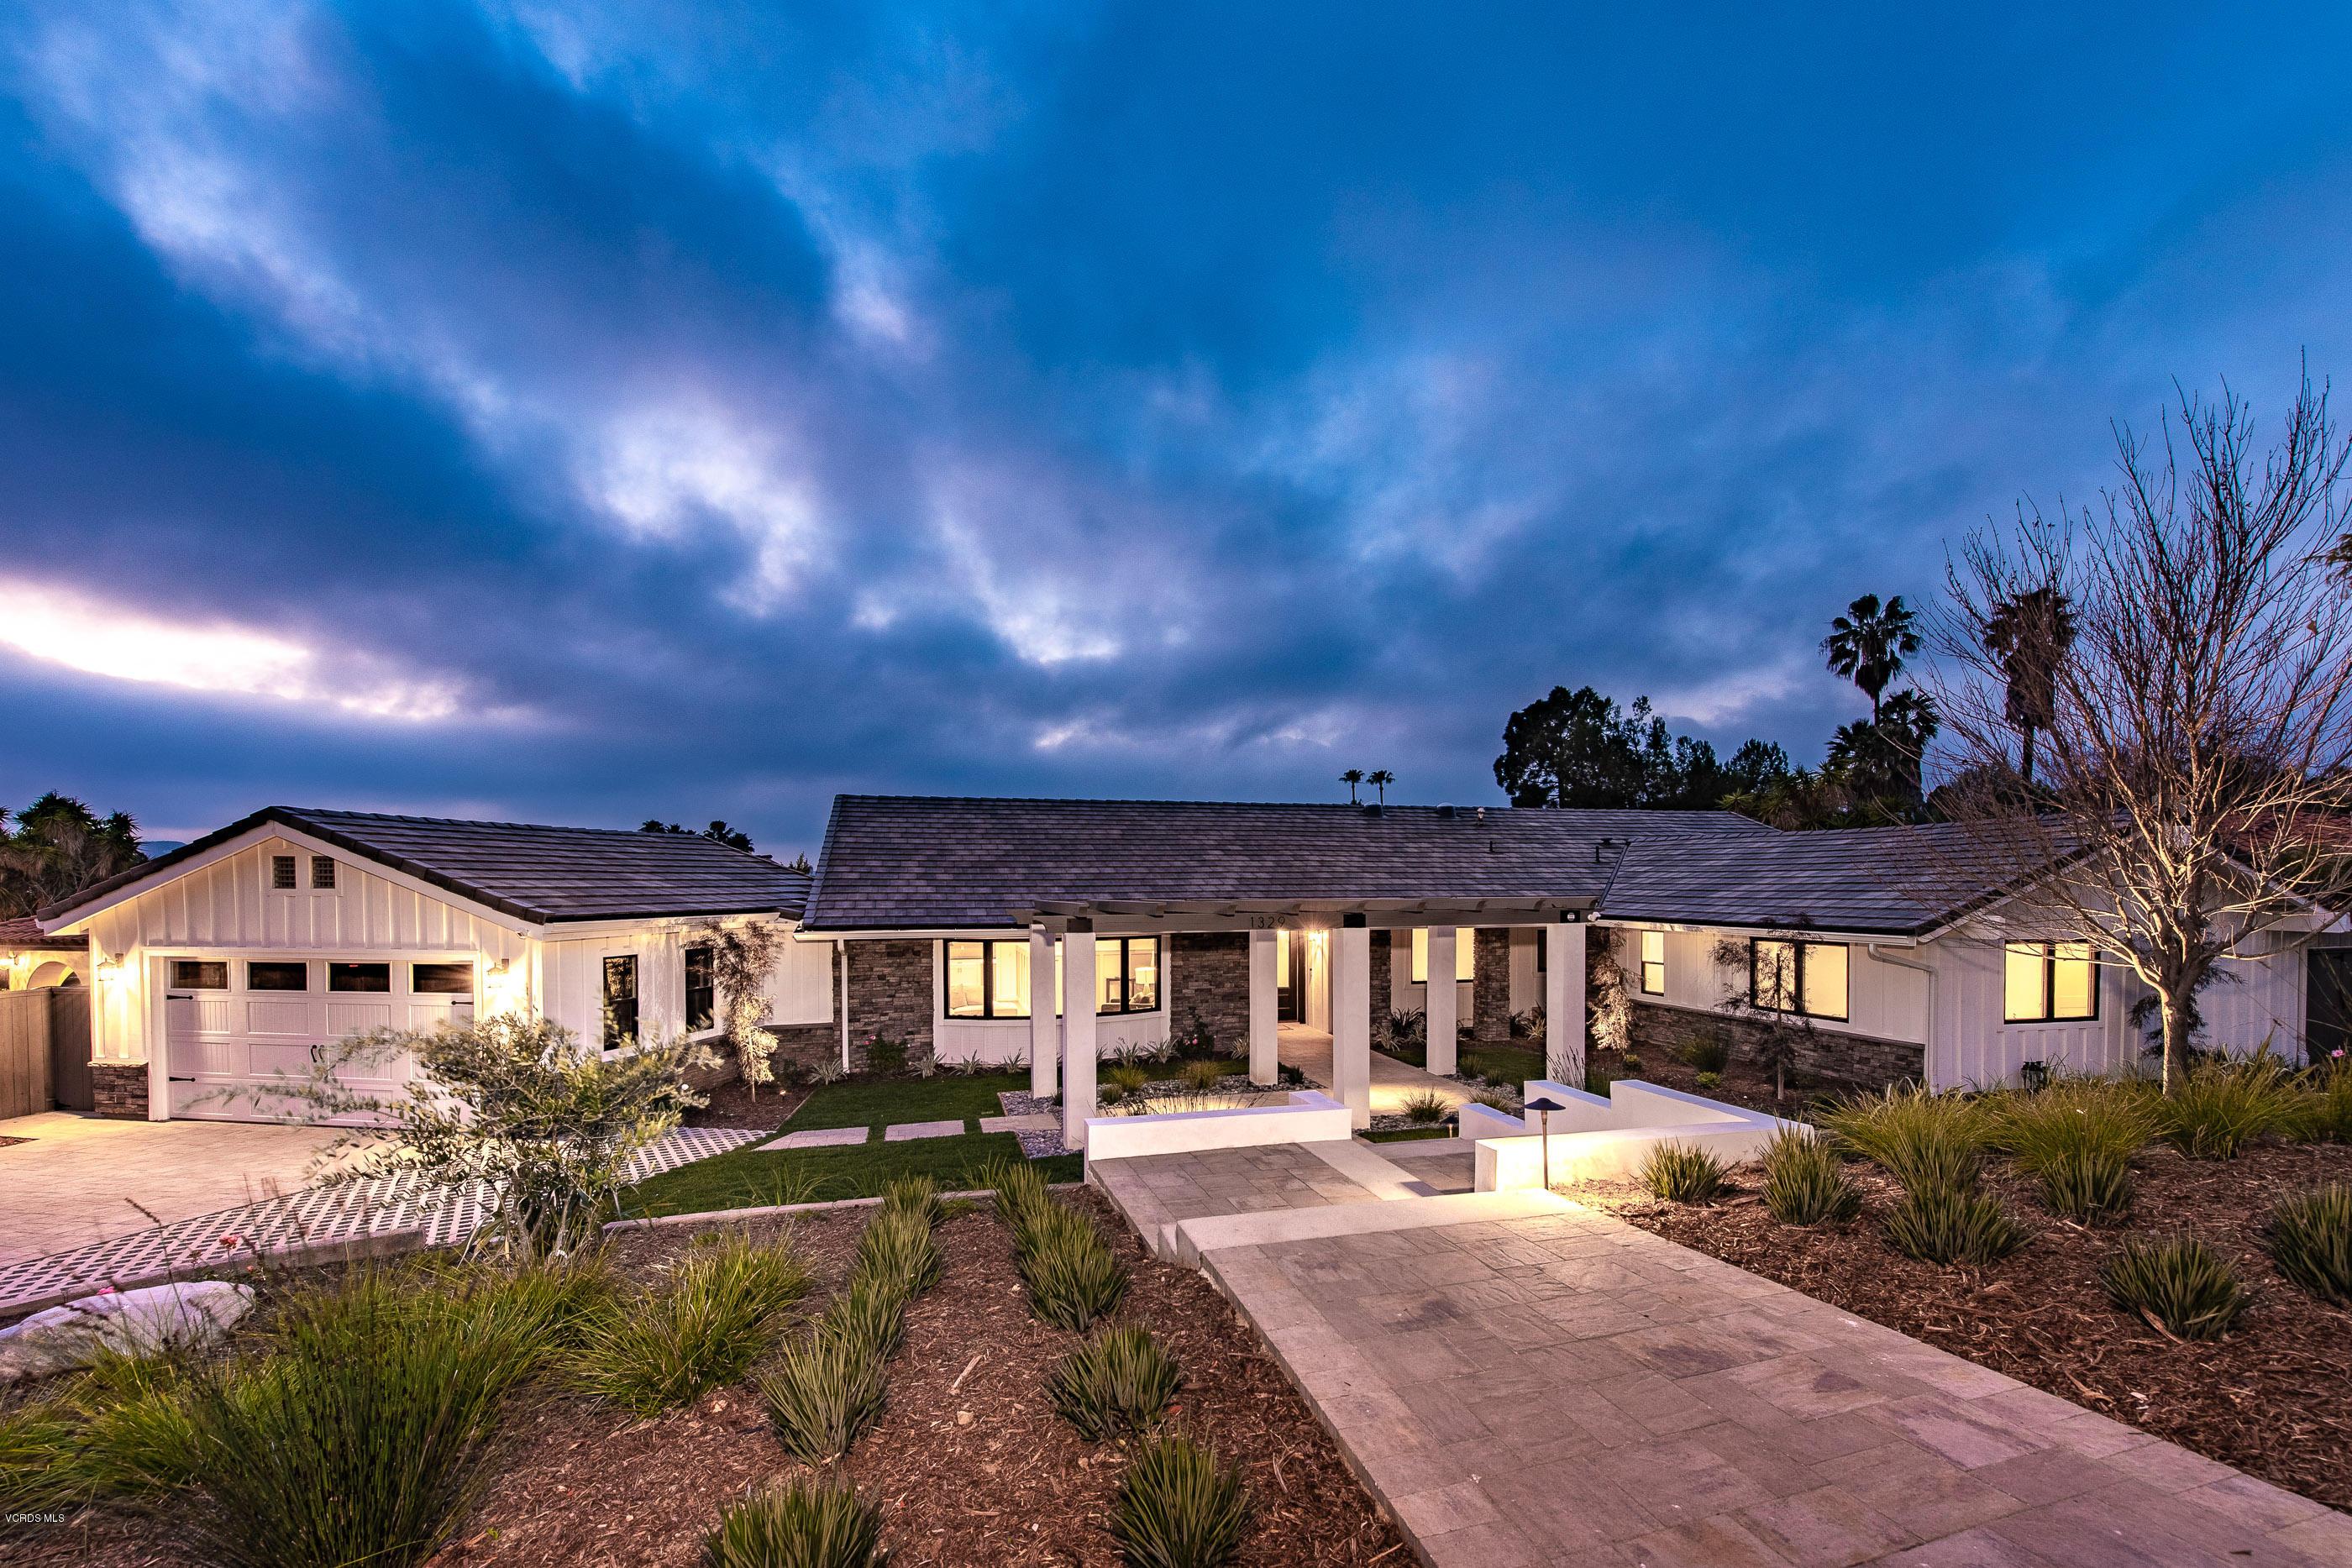 1329 Camino Cristobal, Thousand Oaks, CA 91360